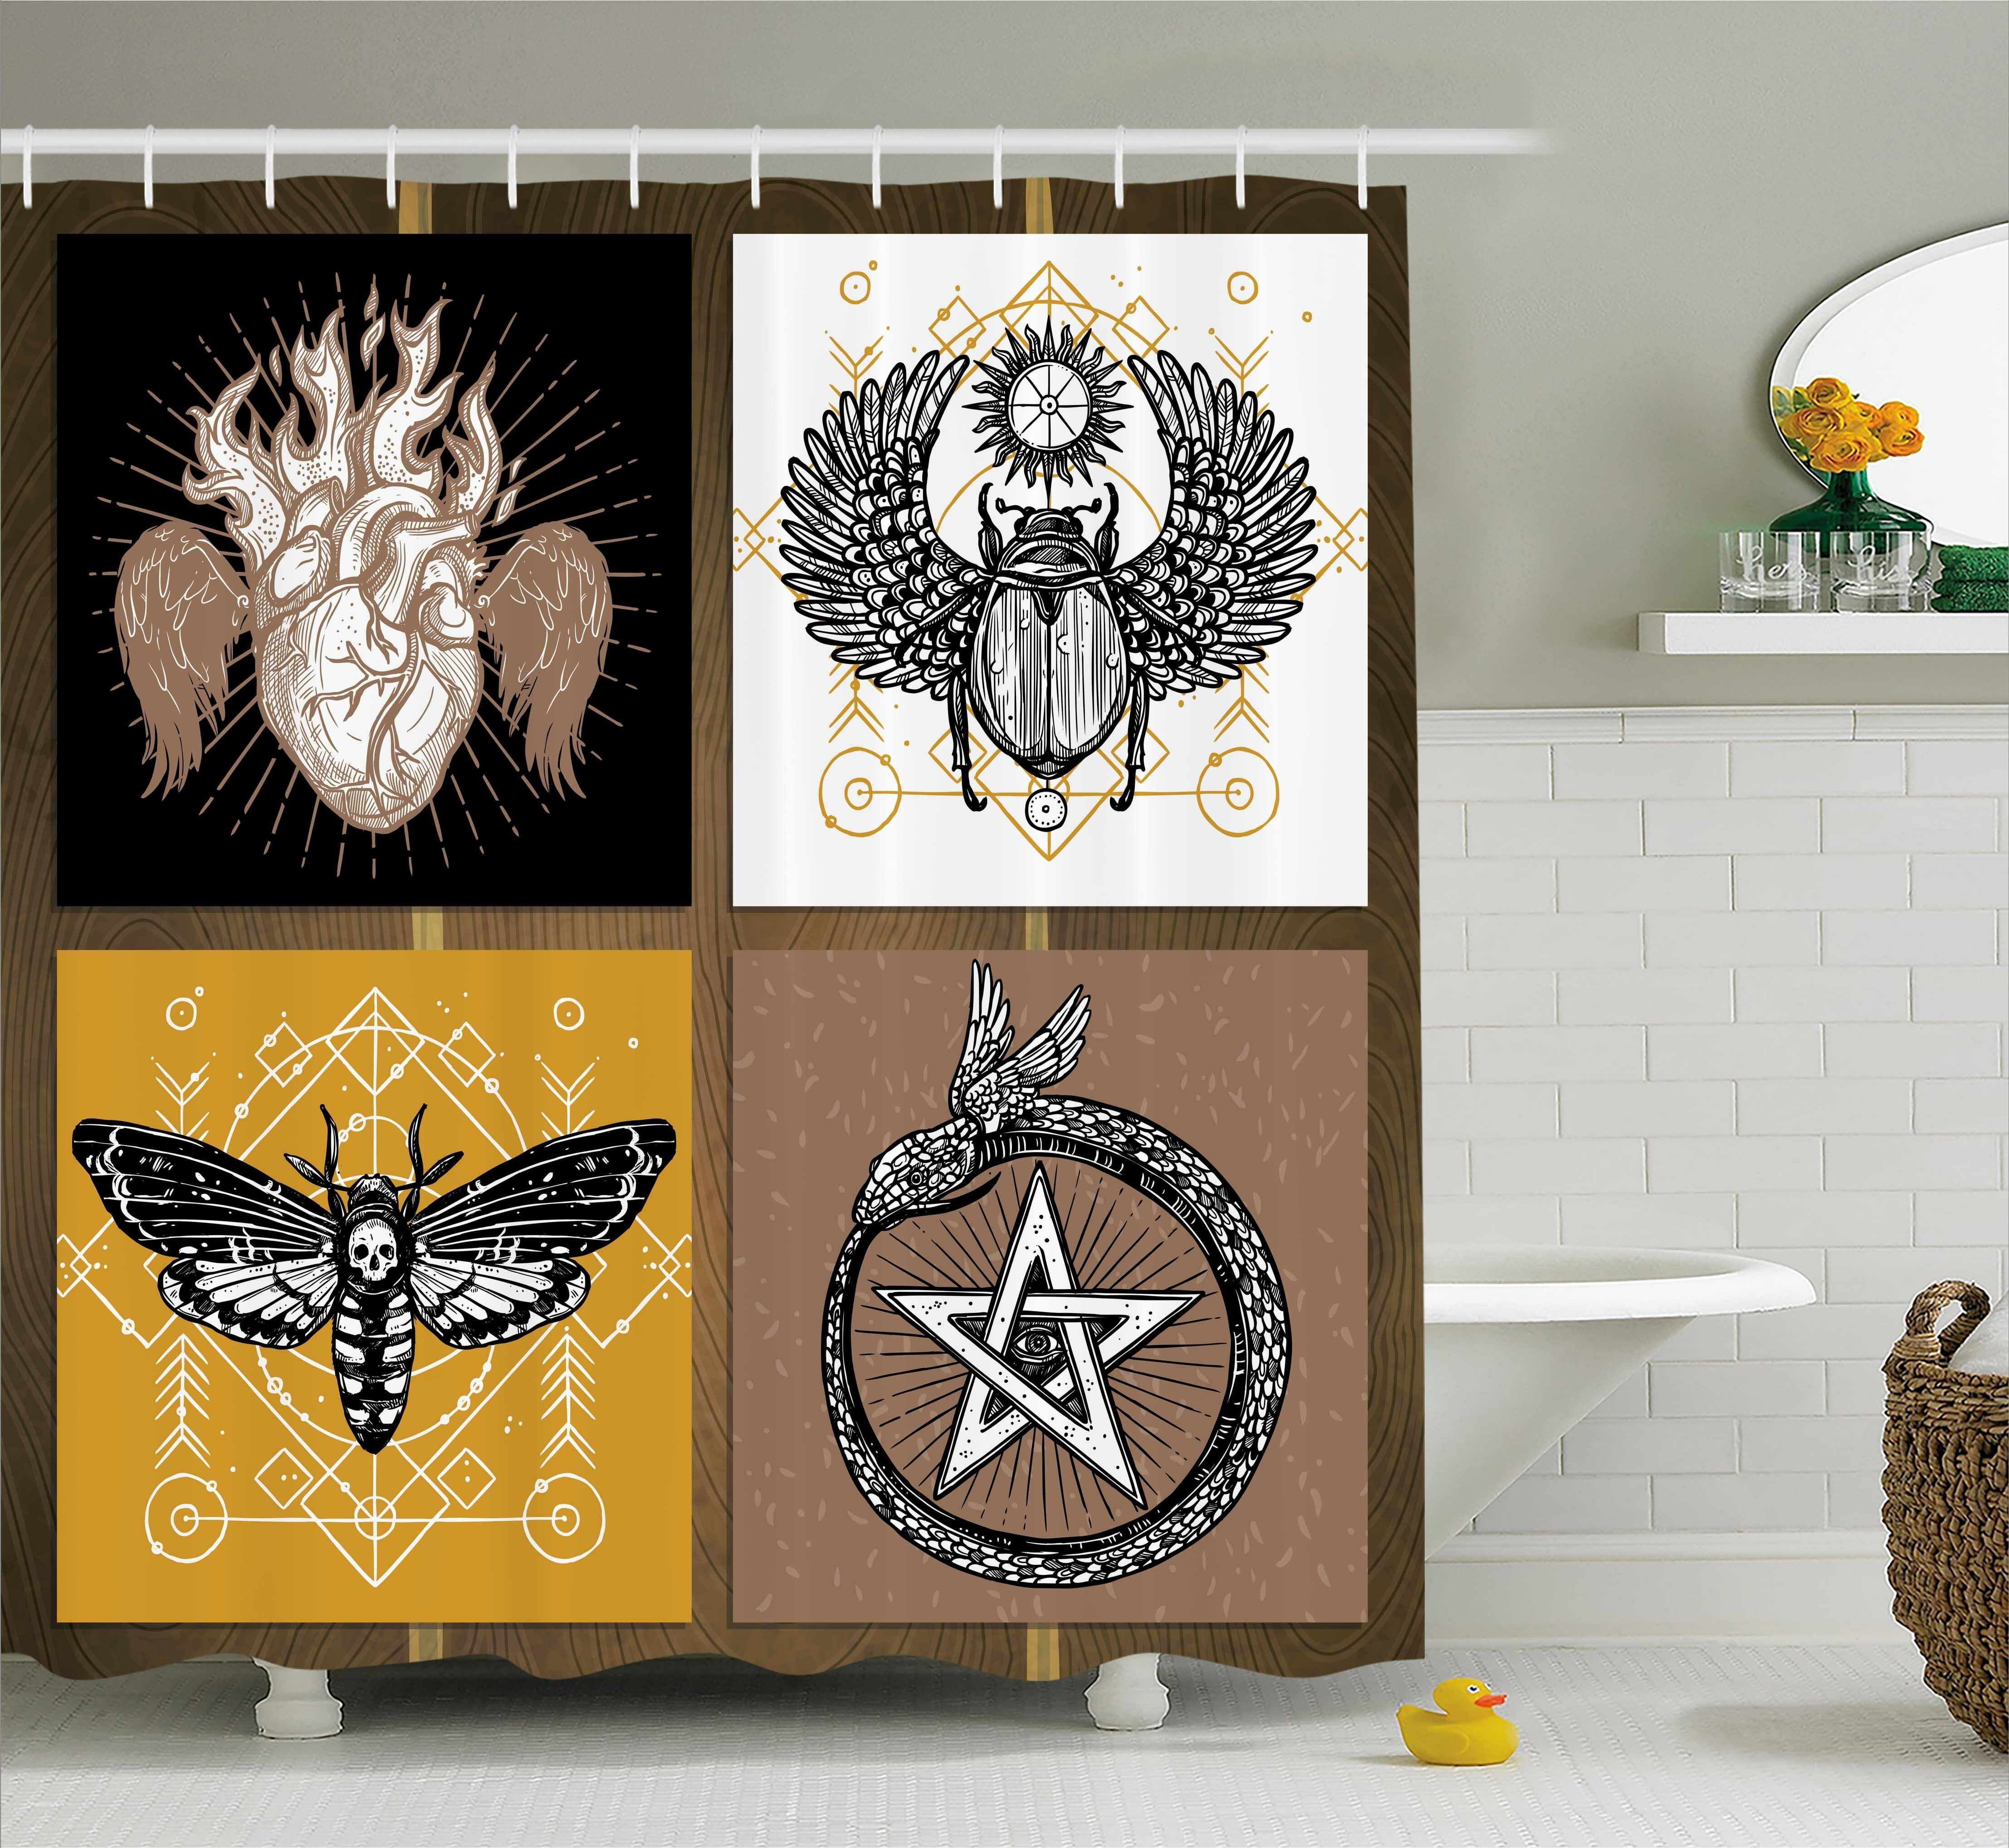 East Urban Home Bohemian Authentic Occult Art Shower Curtain